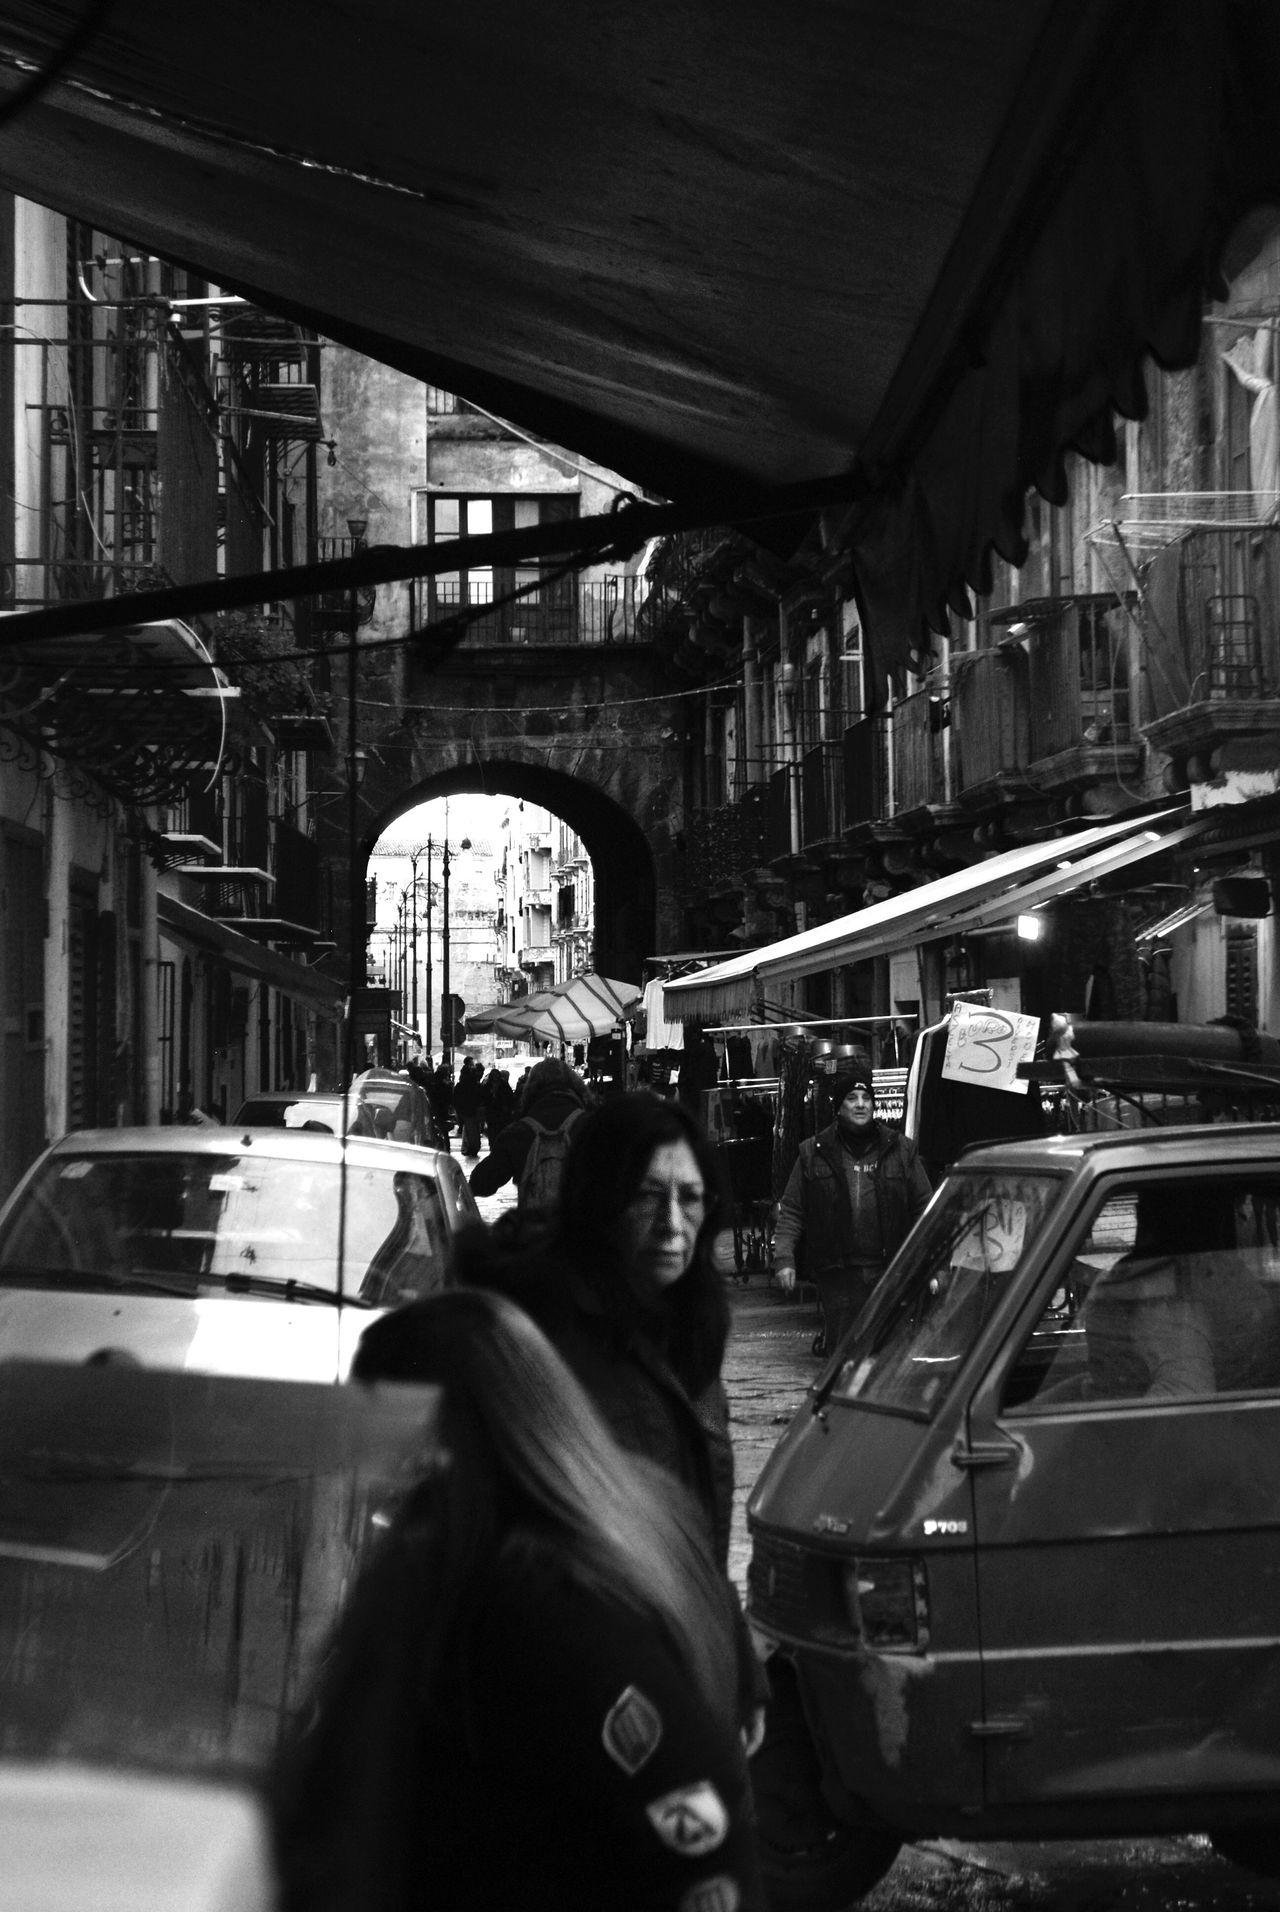 Palermo, Italy Palermo Blackandwhite Blancoynegro Blackandwhite Photography Black And White Photography Blanco & Negro  B&w Street Photography Blanco&negro Welcome To Black BYOPaper! BYOPaper!